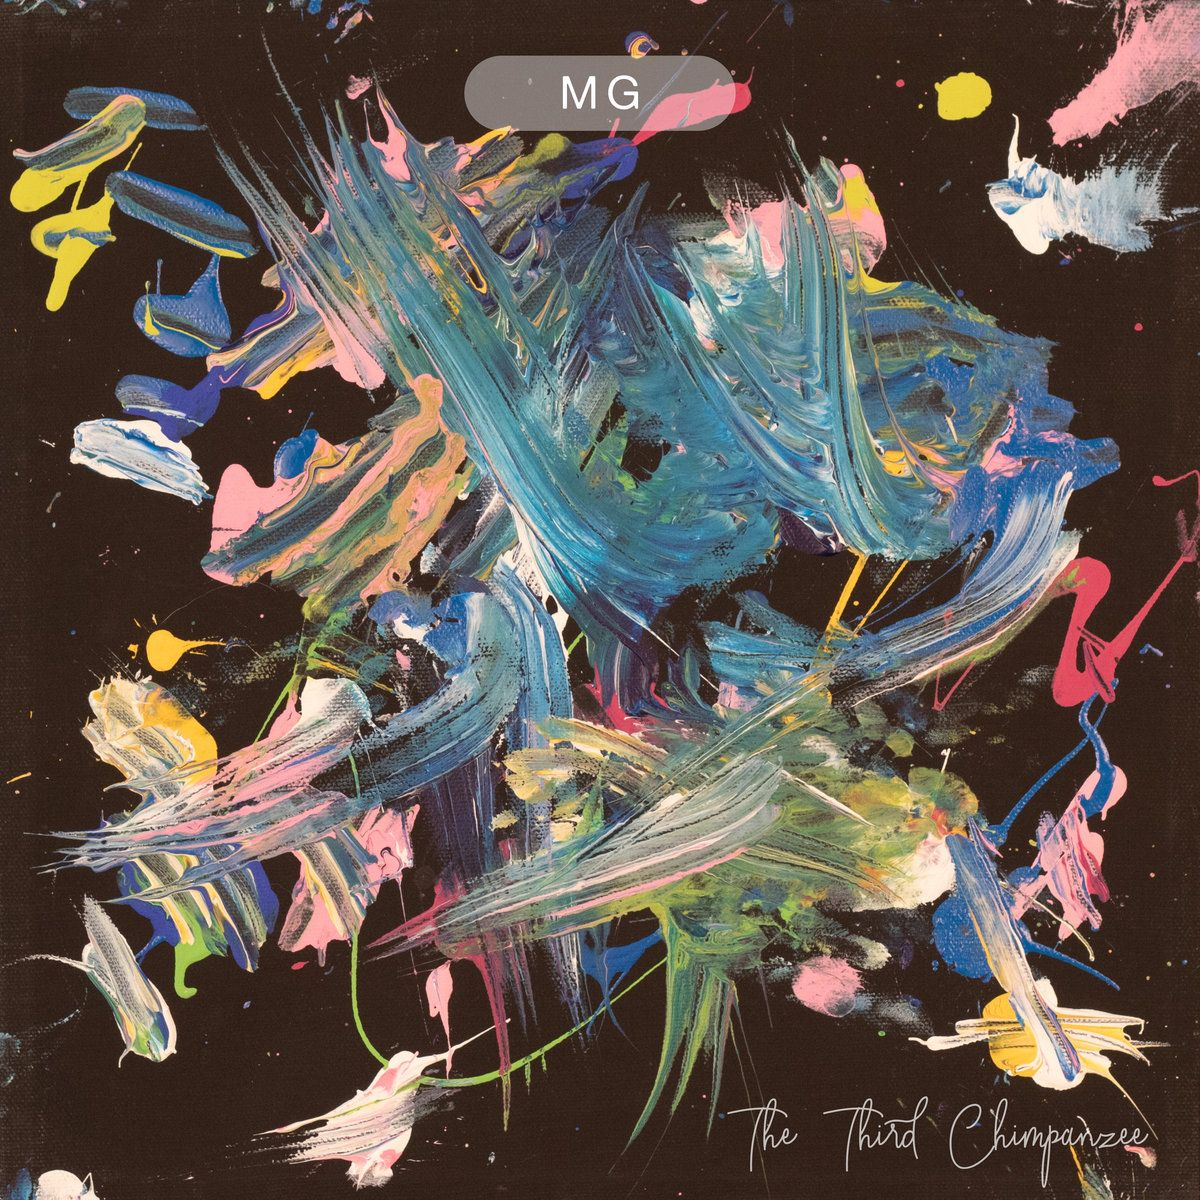 Martin L. Gore - The Third Chimpanzee EP - CD